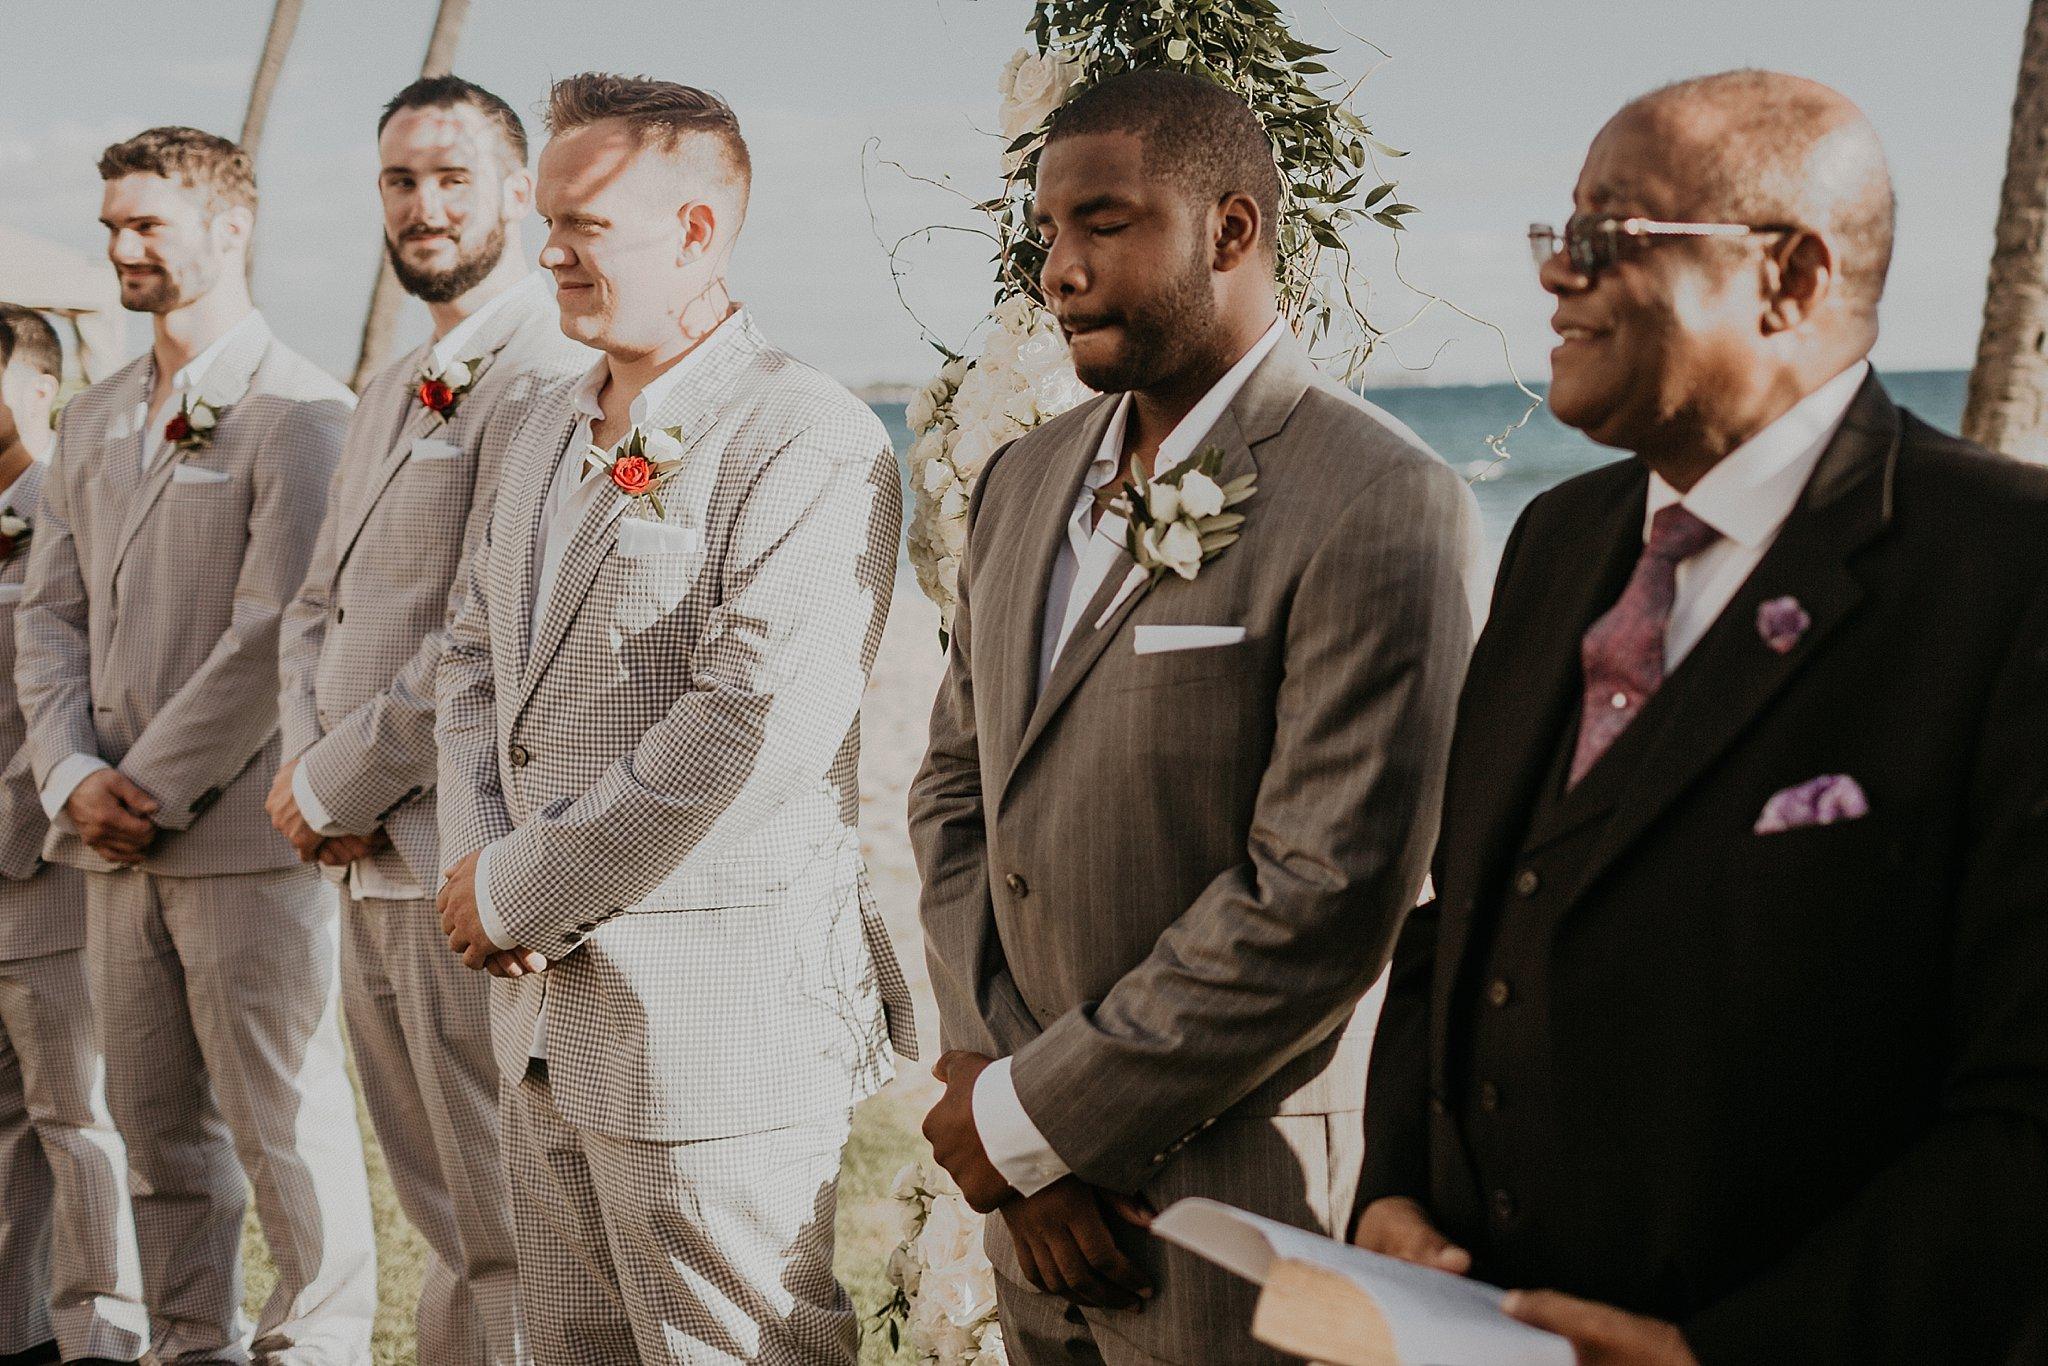 samantha_mcfarlen_bellingham_washington_engagement_photography_seattle_wedding_photographer_0201.jpg